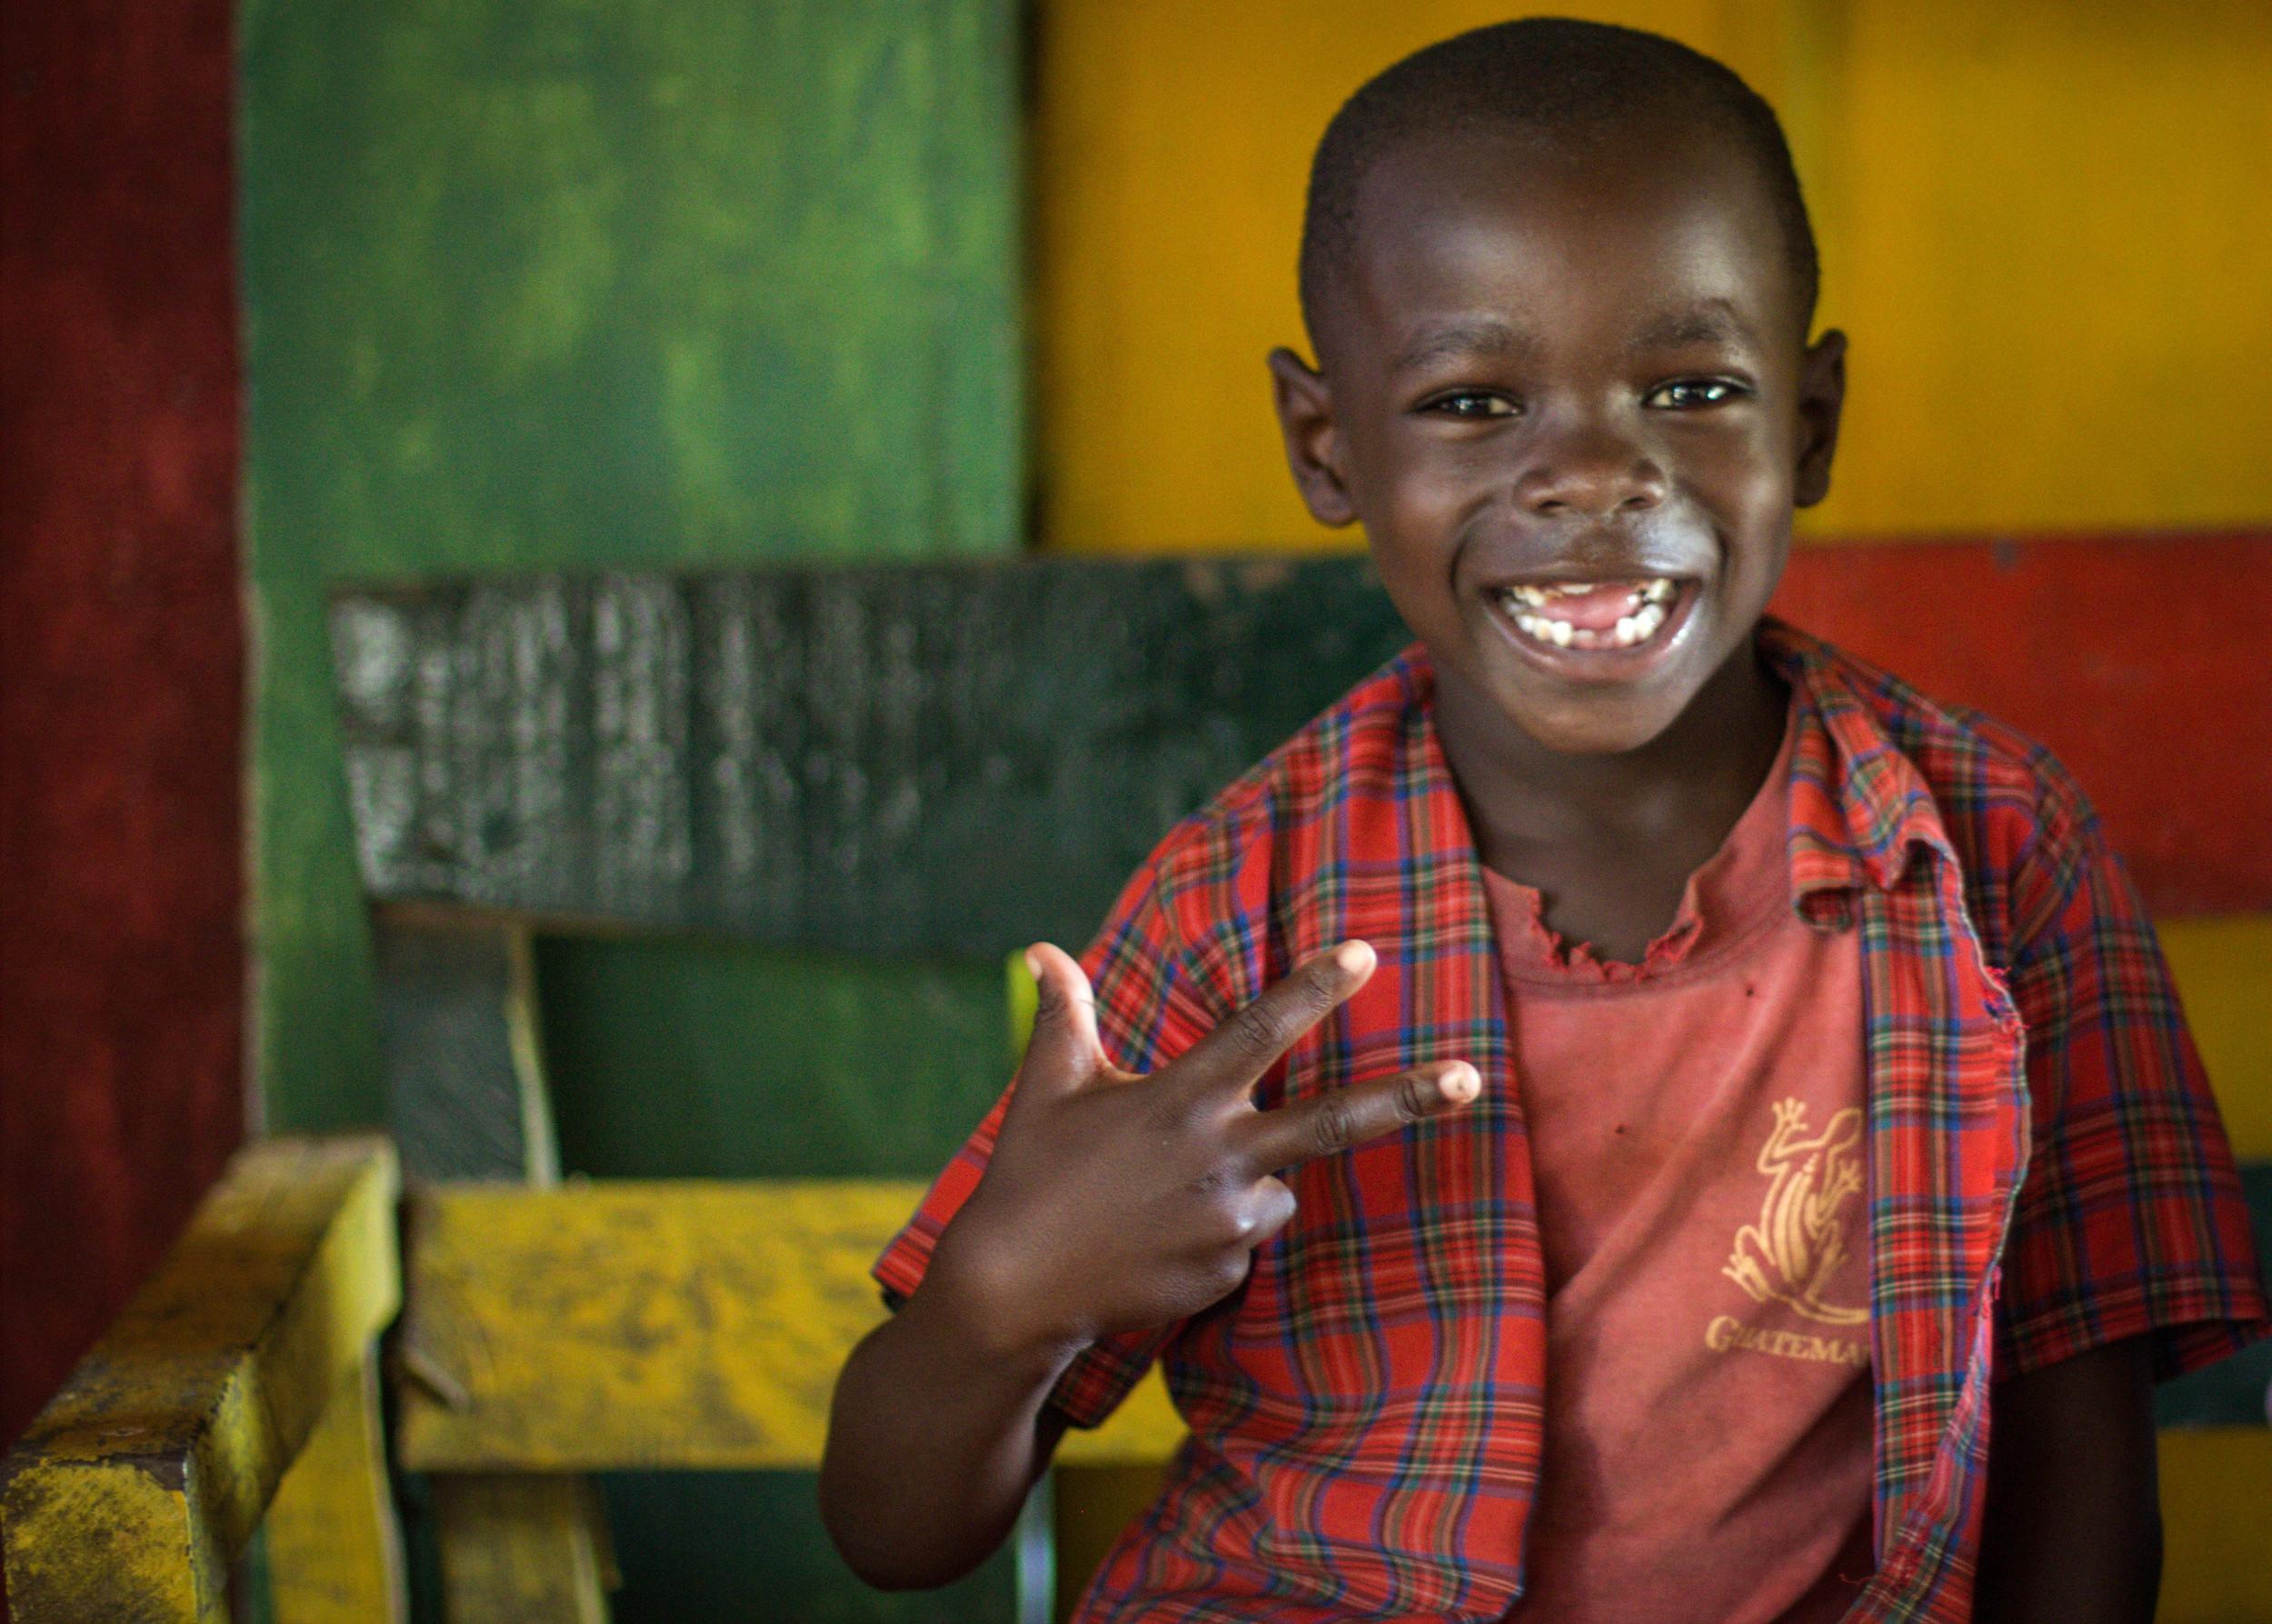 garifuna little boy smiling